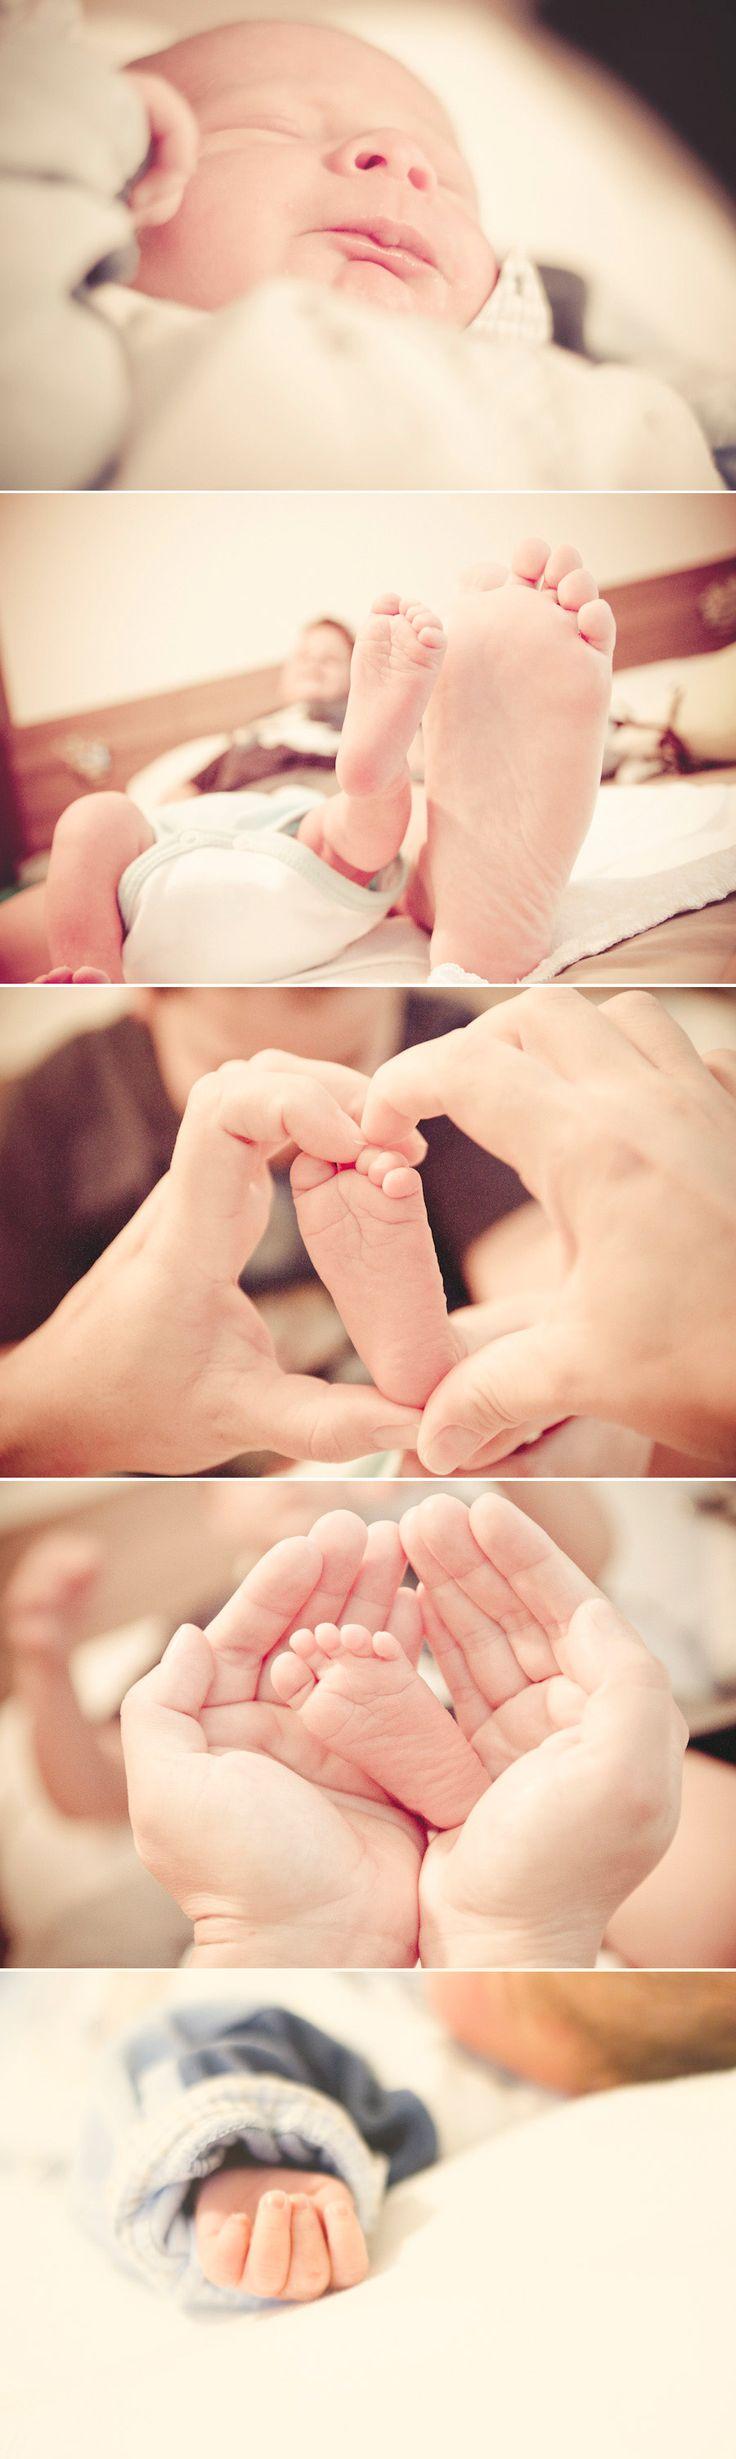 ENZO # SESSÃO NEW BORN # SÃO PAULO    #baby #newborn #photography #photo #kid #family